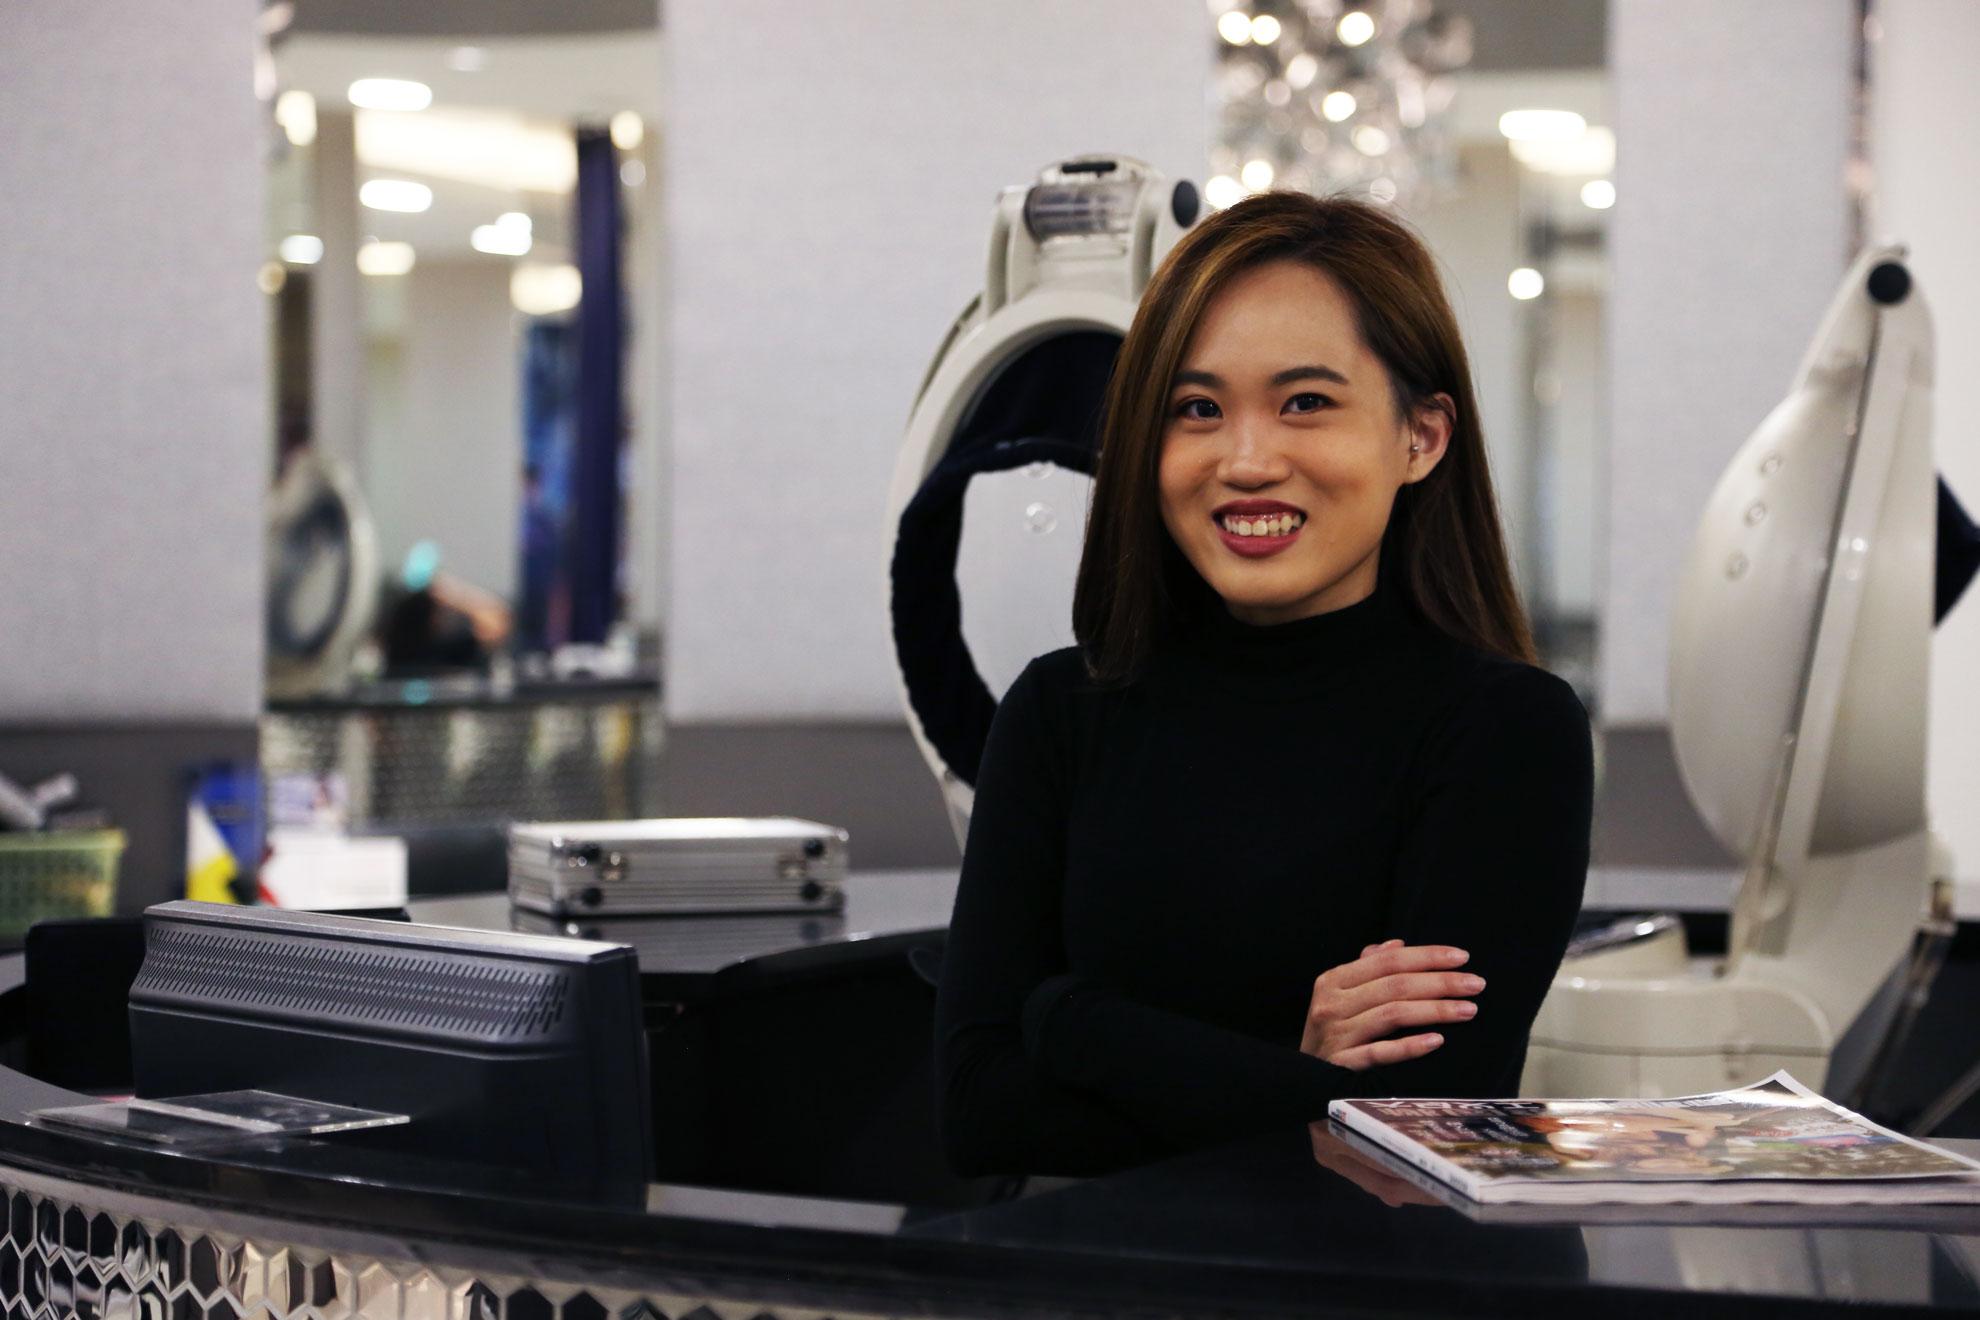 Fave Beauty Merchant, Hair Salon